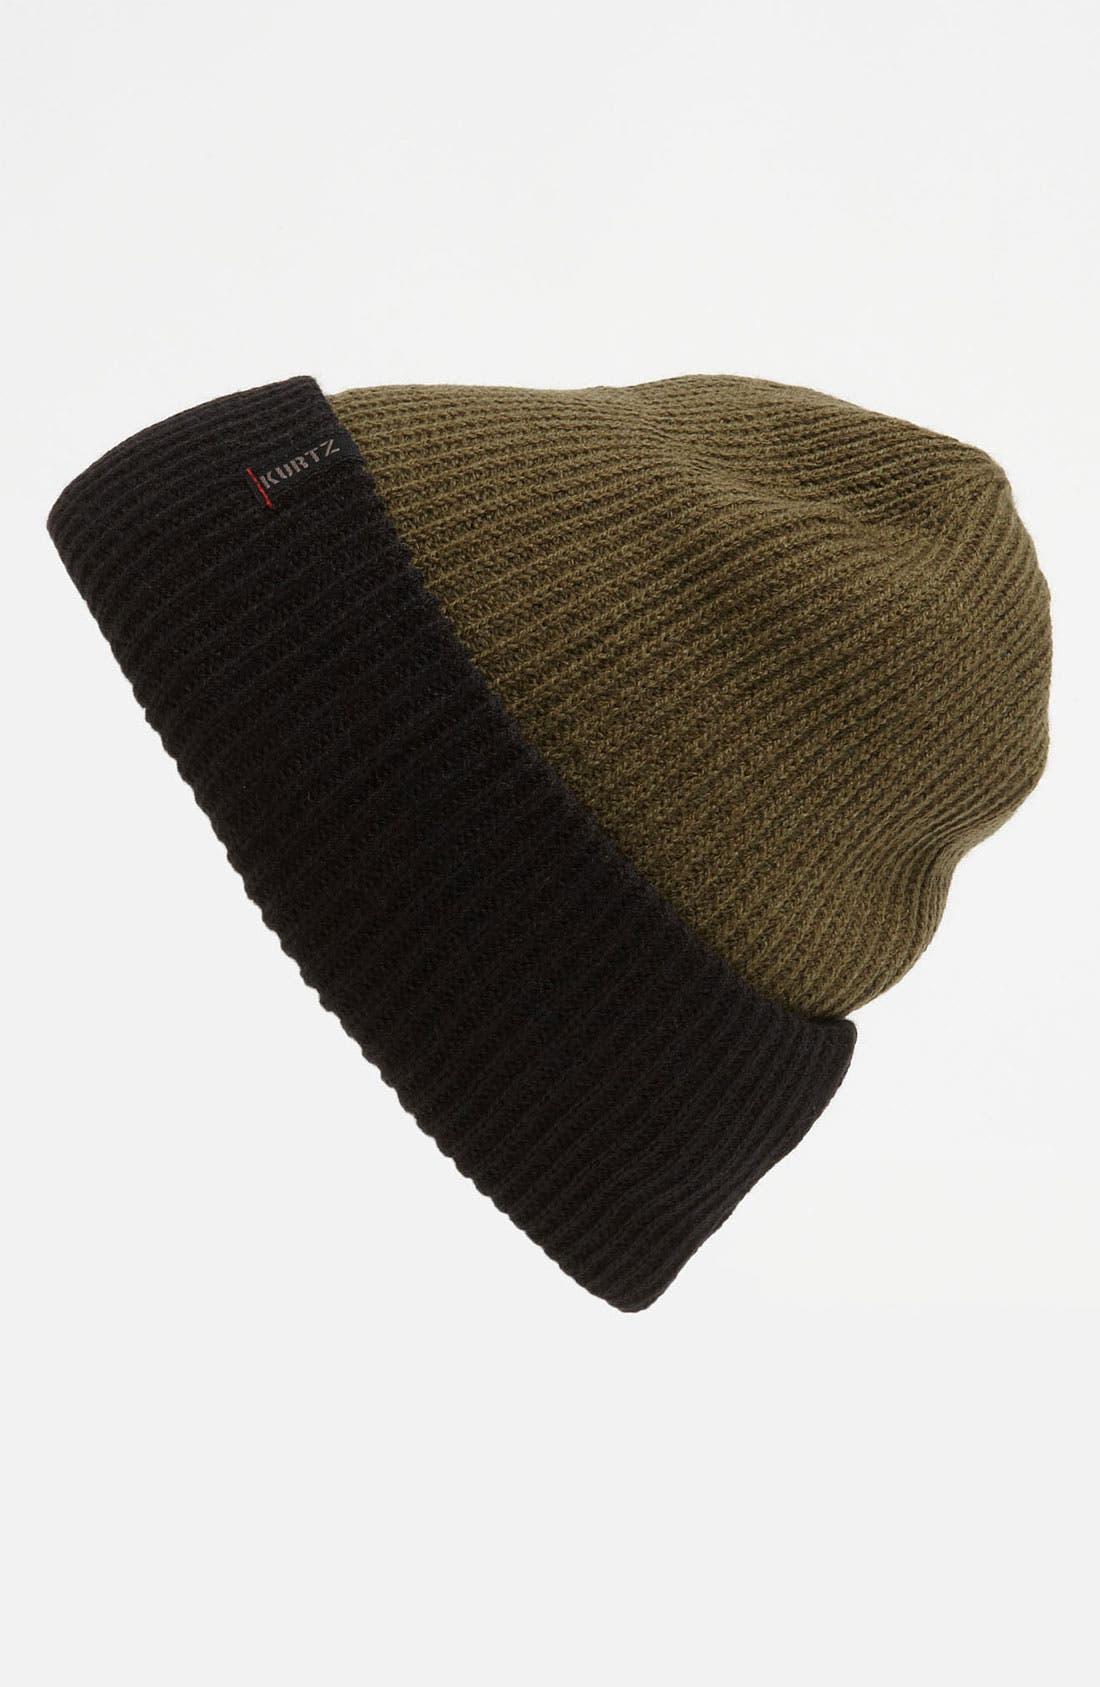 Main Image - A. Kurtz 'Wayne' 4-in-1 Reversible Wool Blend Beanie